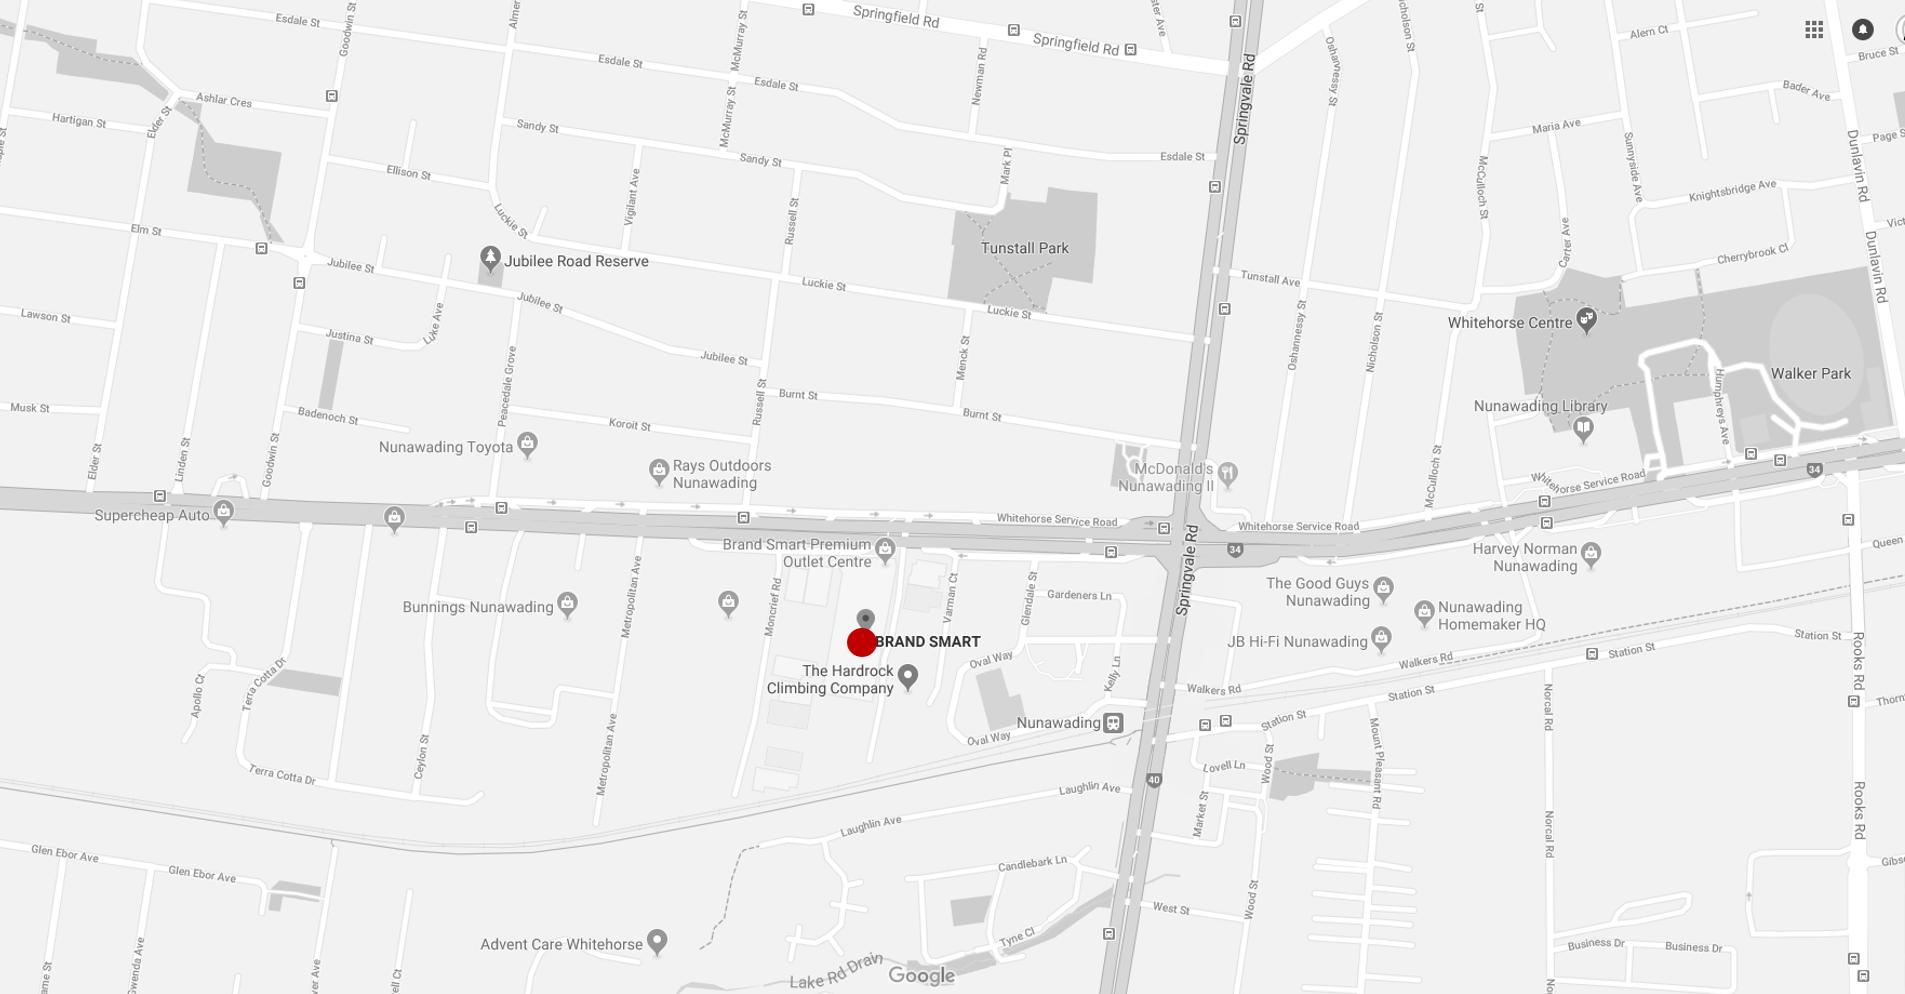 Brand Smart Location